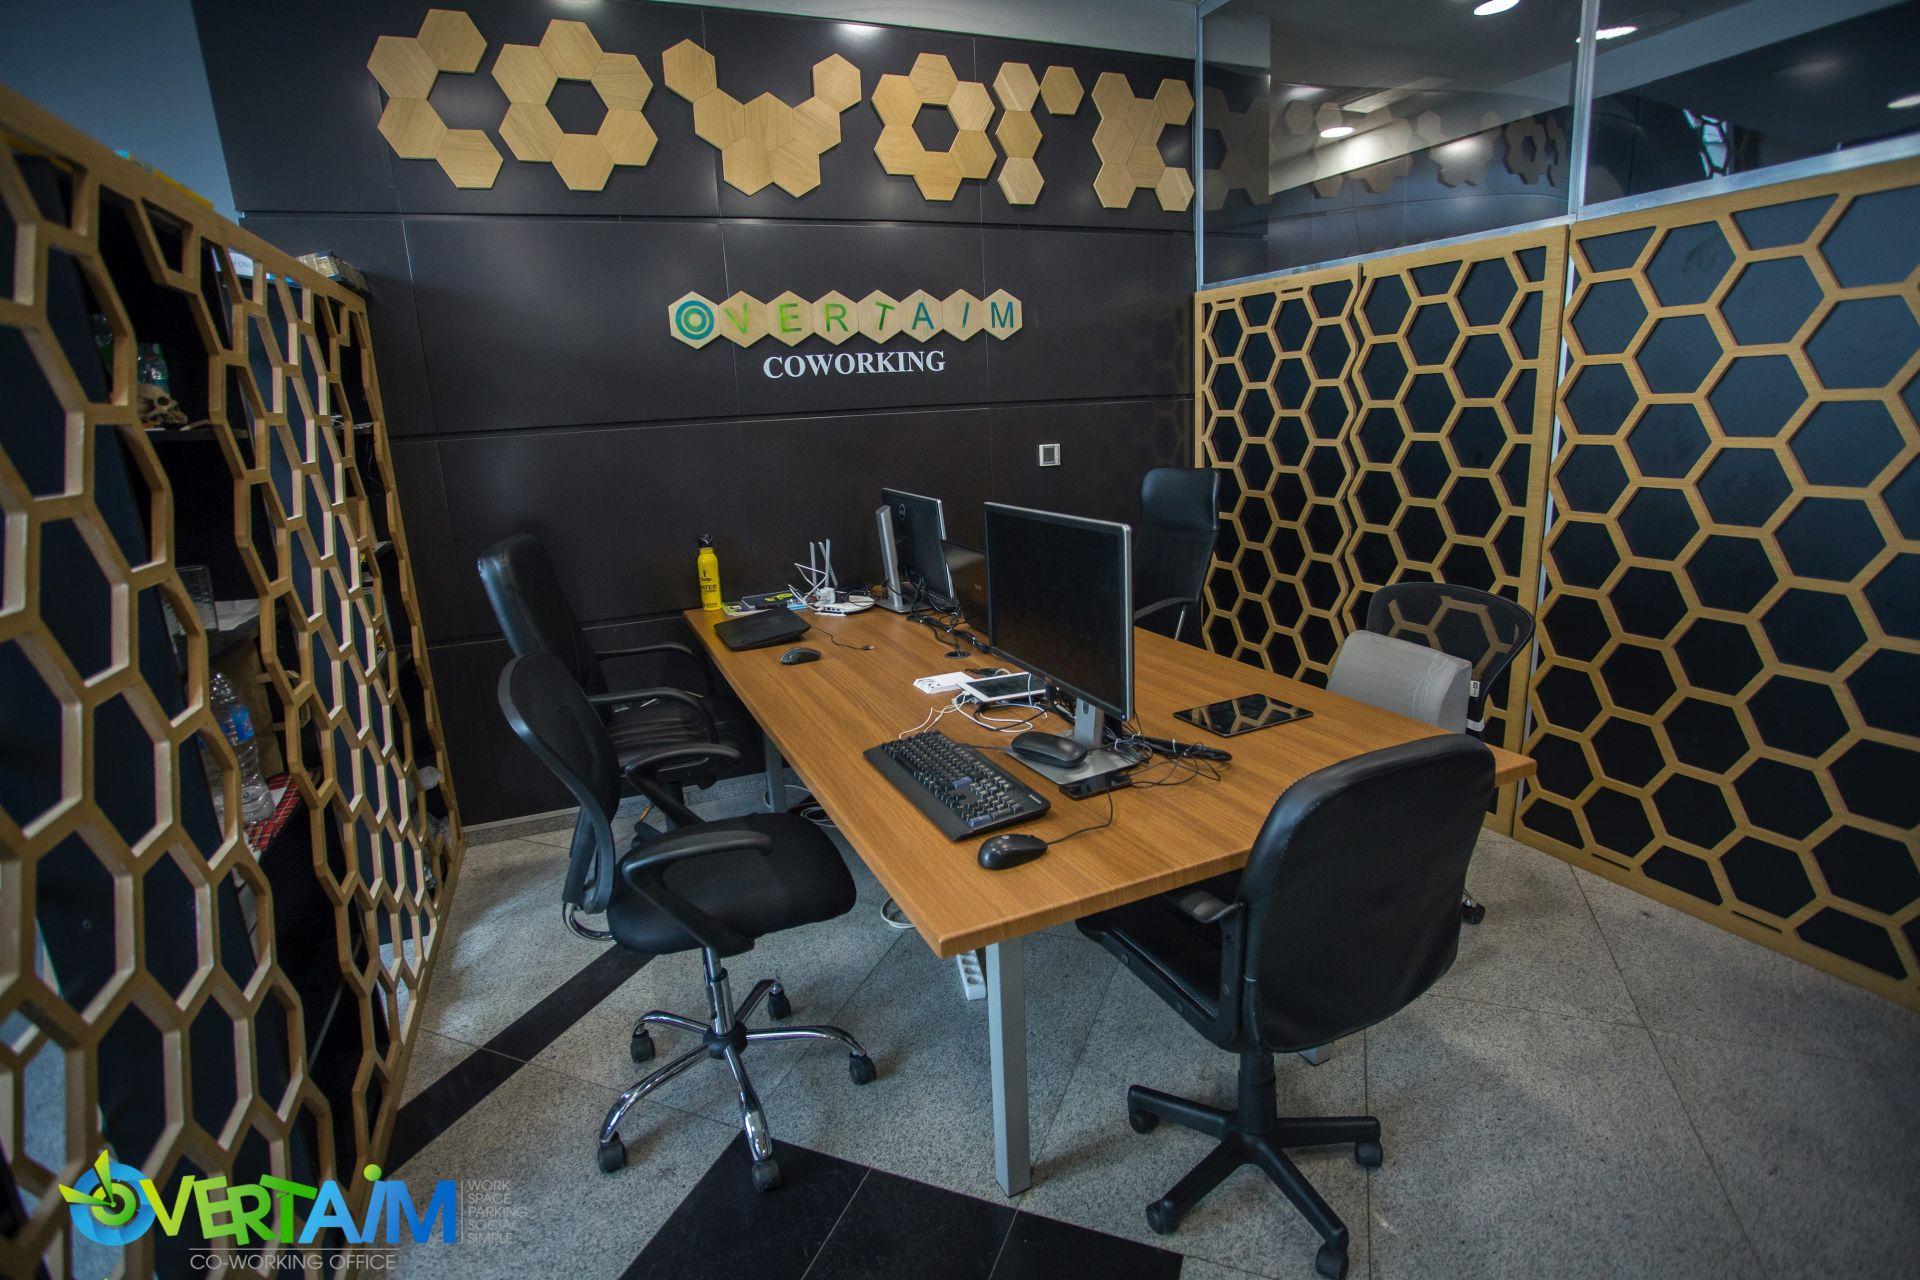 Overtaim South Coworking Space, Sofia